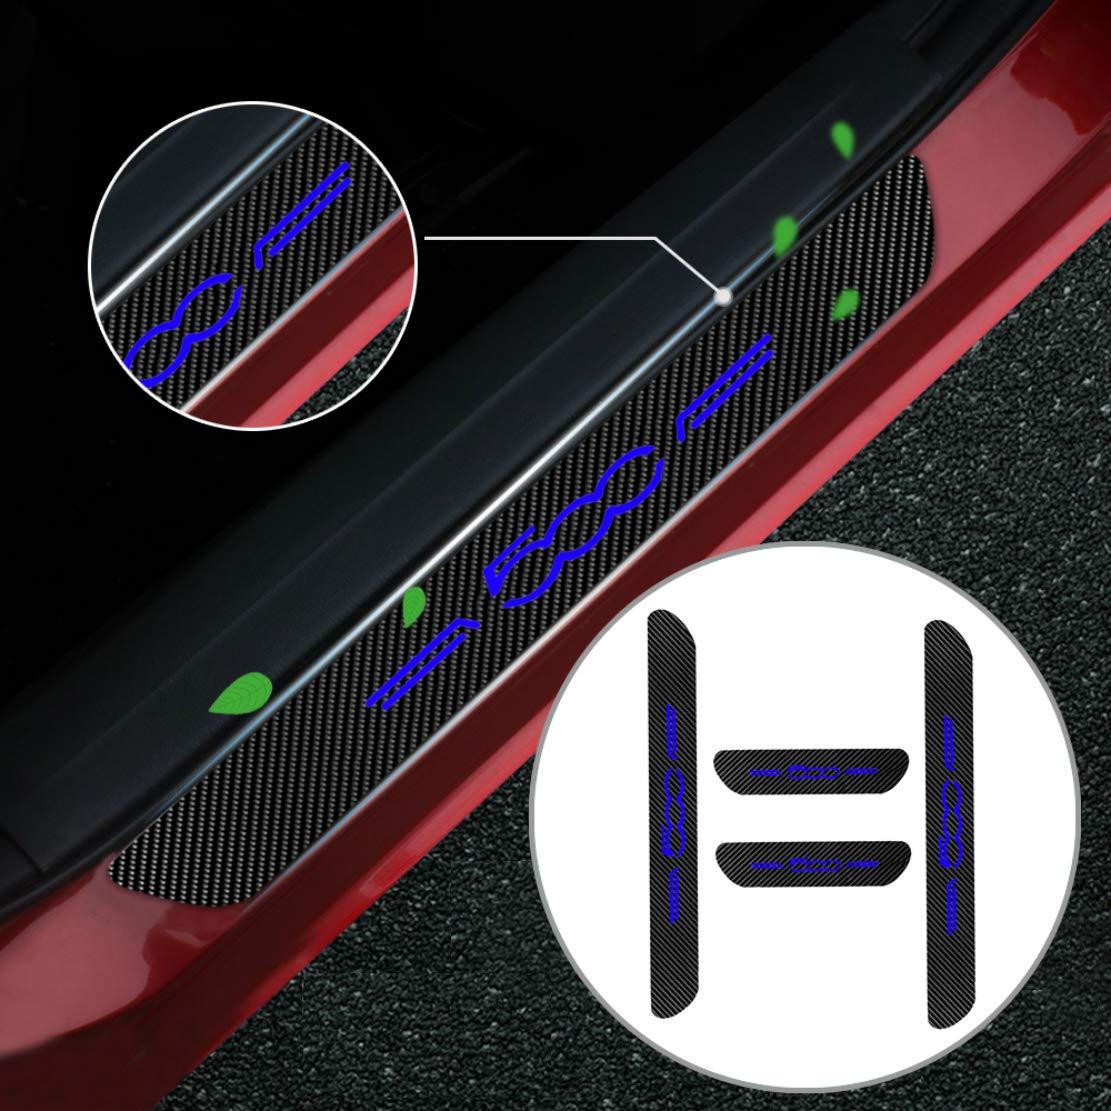 Per 500 Carbon Fiber Door Sill Scuff Pedal Proteggi Car Styling Sticker soglia di copertura 4 pezzi blu